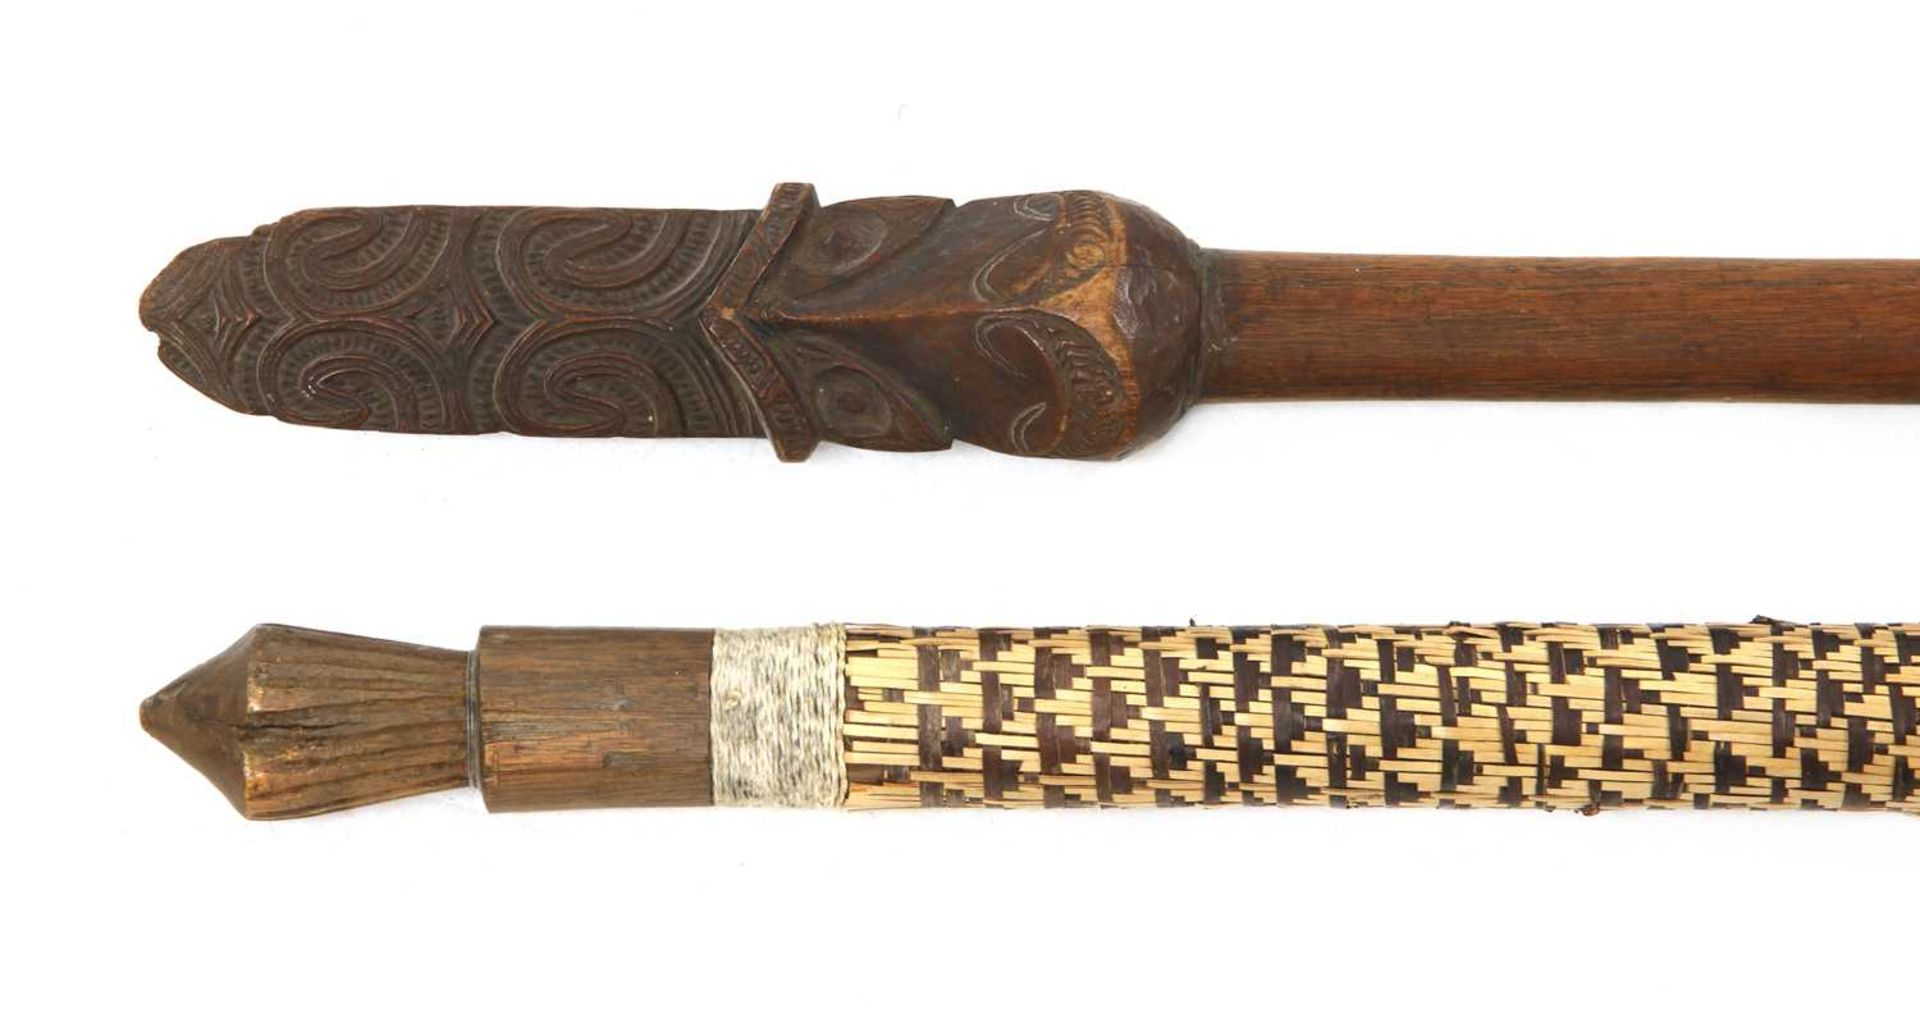 A Maori taiaha dance paddle, - Image 2 of 16